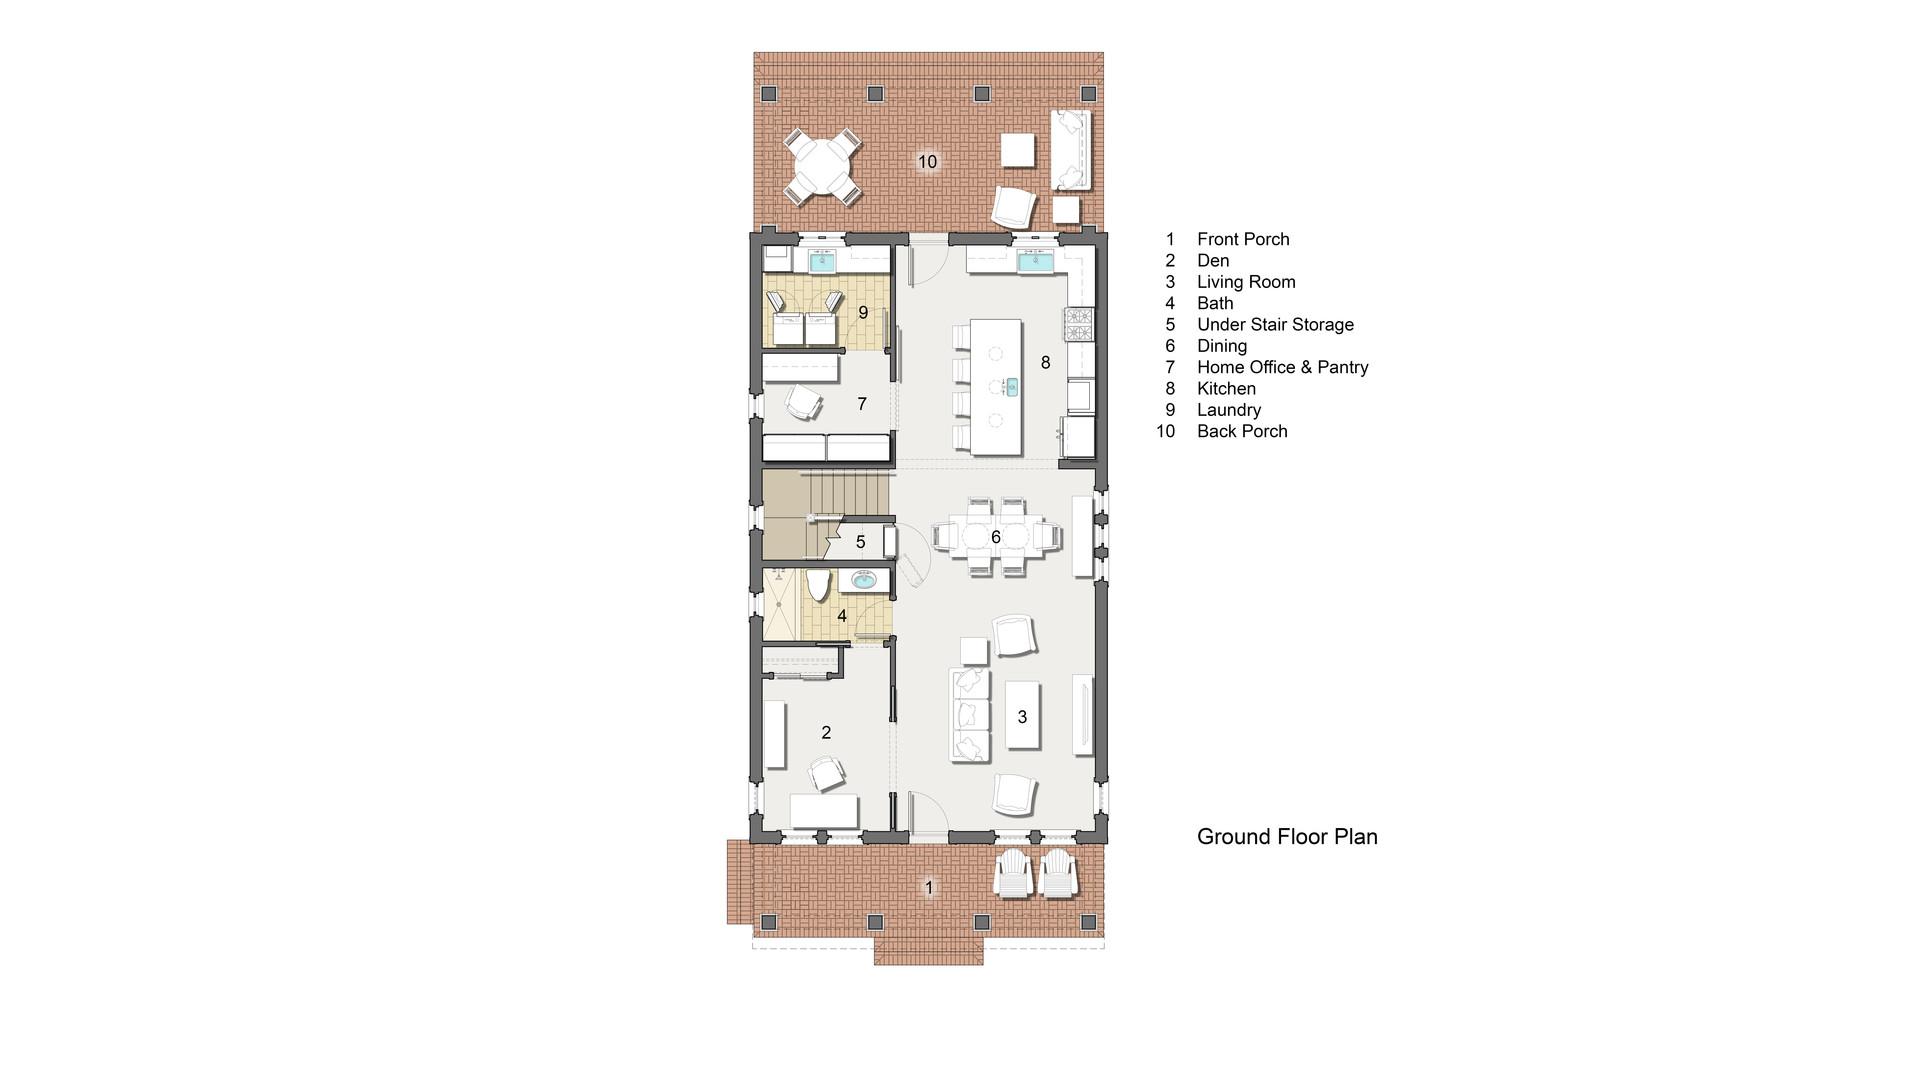 Dietz Residence-Ground Floor Plan.jpg